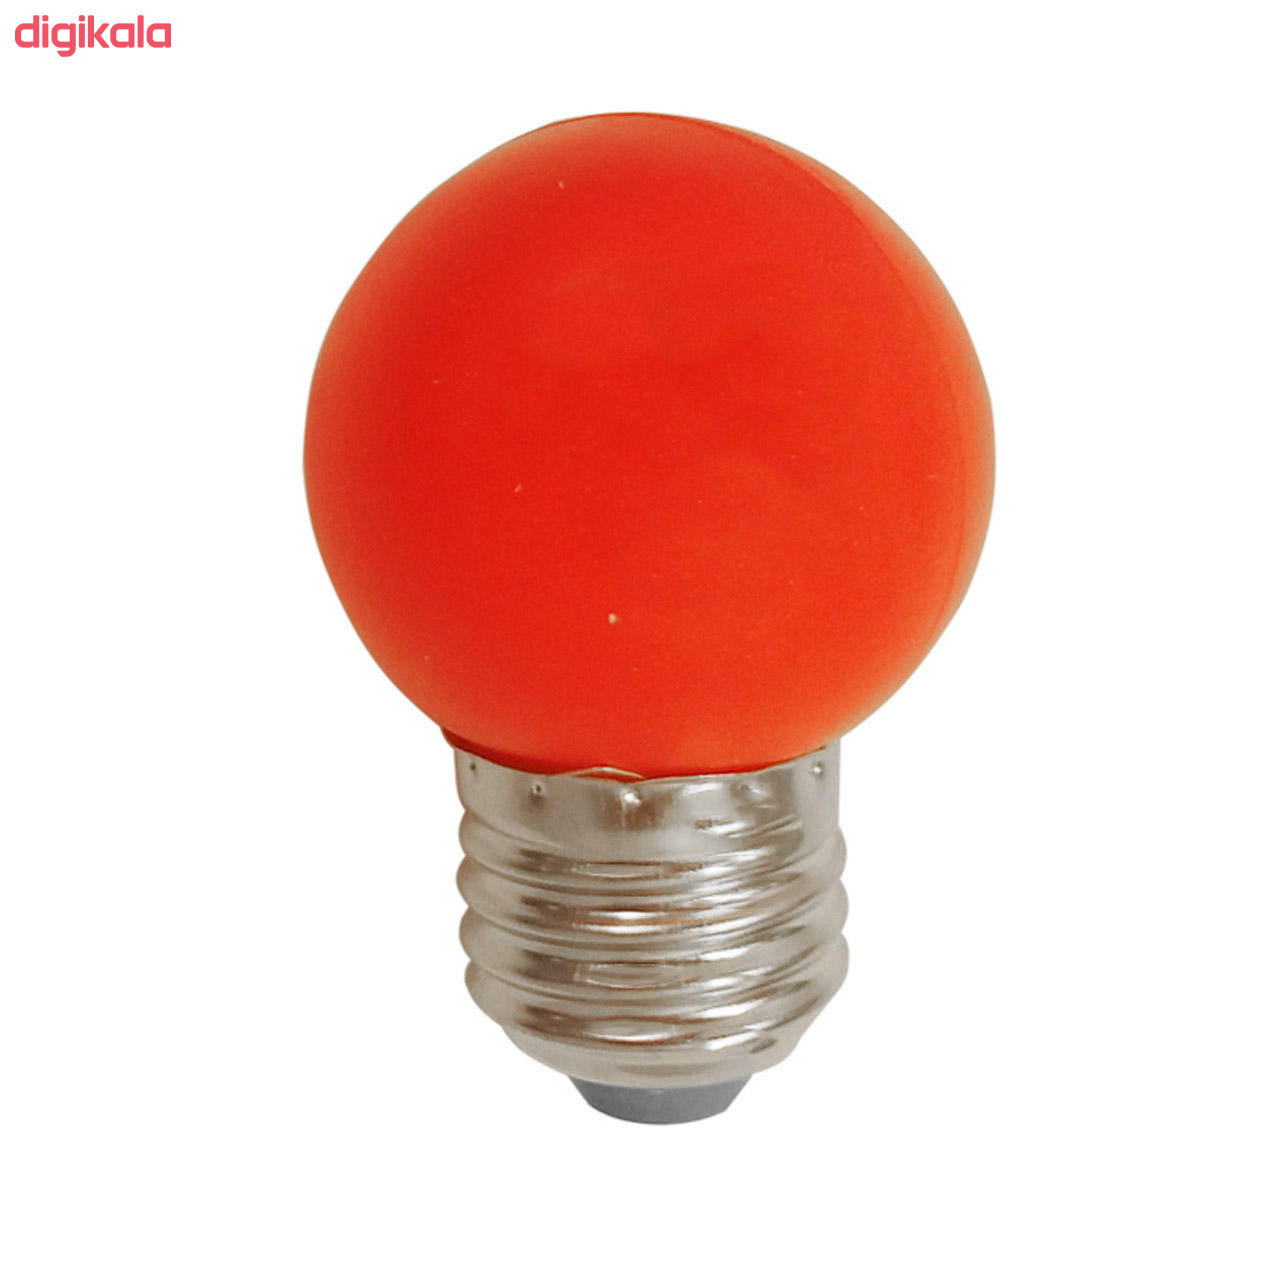 لامپ ال ای دی 0.2 وات پارسی نور کد 05 پایه E27  main 1 1